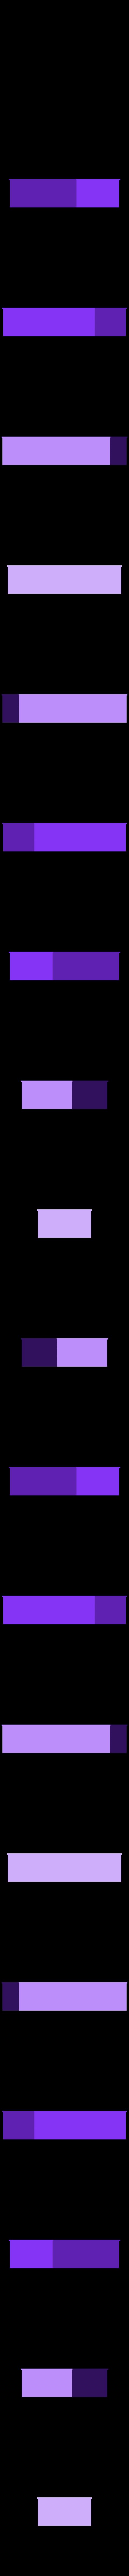 box1.STL Download free STL file Box with sliding lid • 3D printer object, Michael_moi